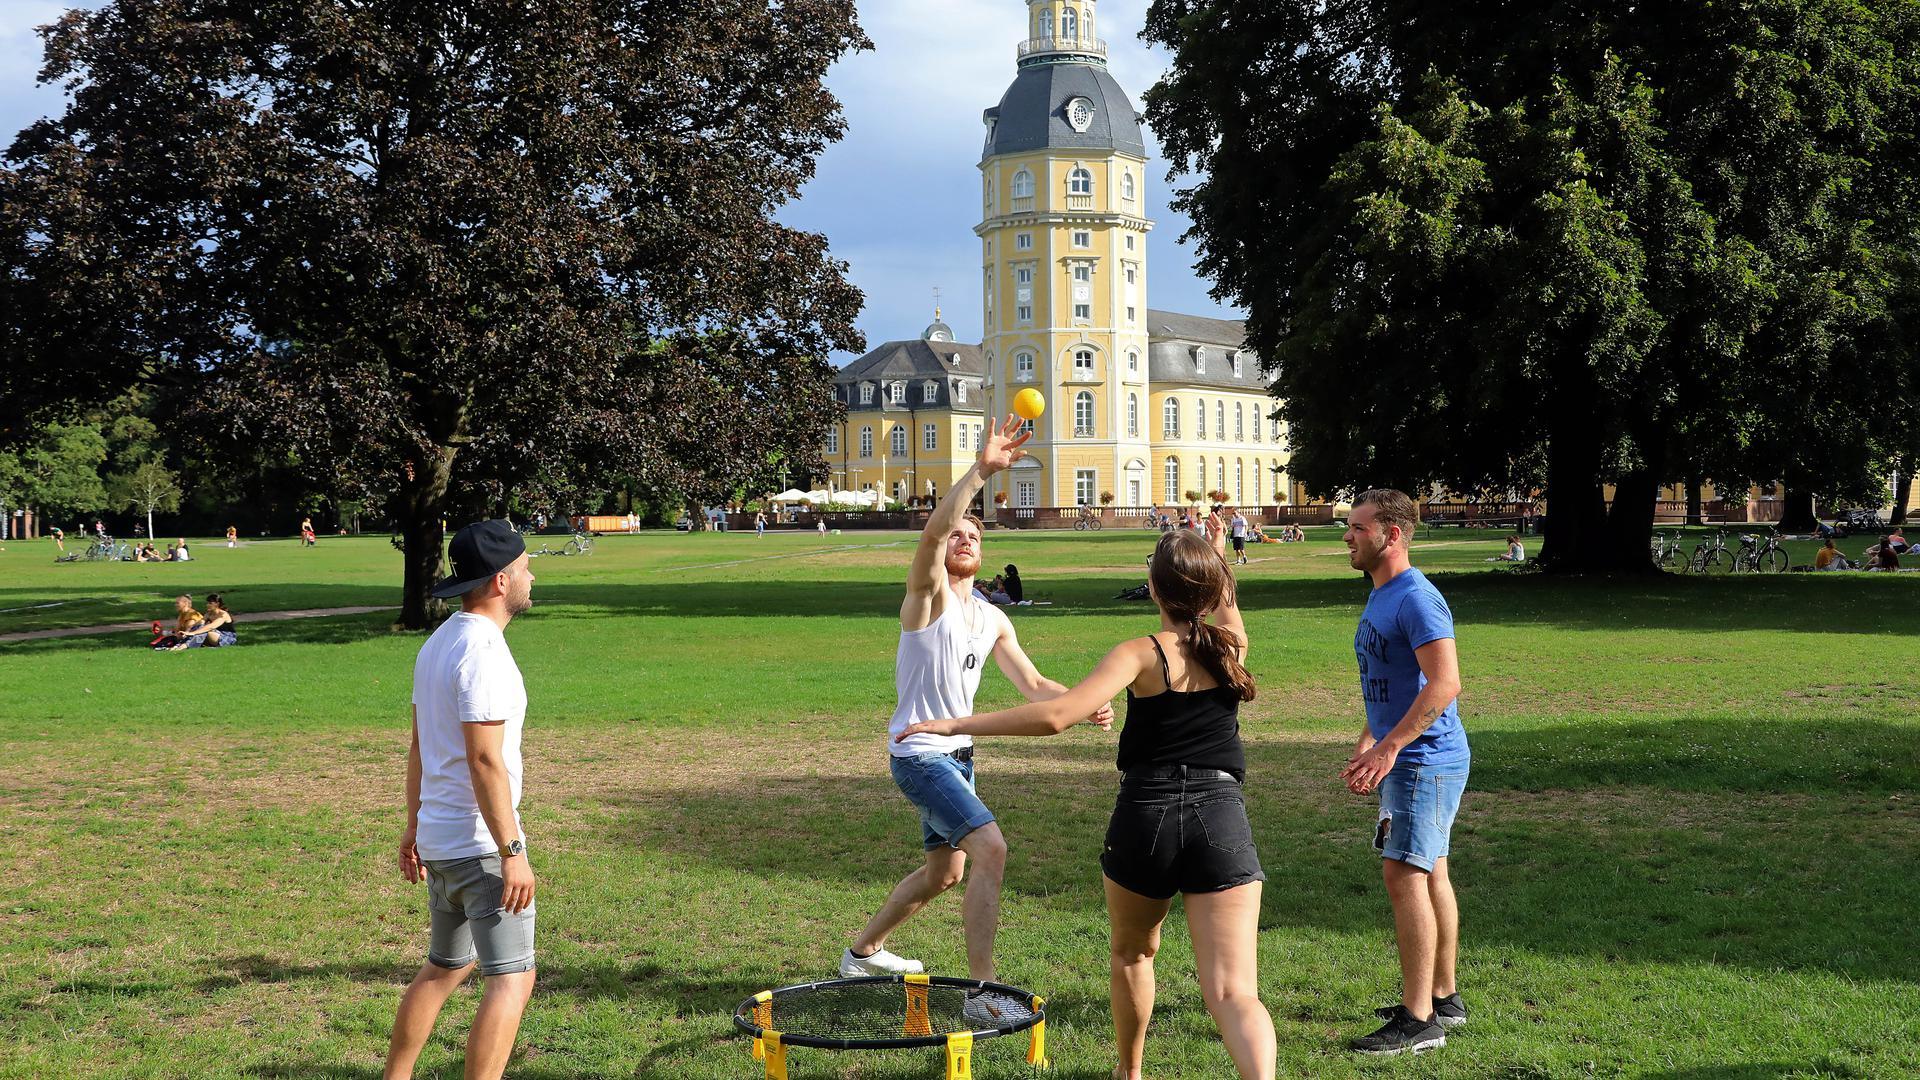 Vier junge Leute spielen vor dem Karlsruher Schloss Spikeball.